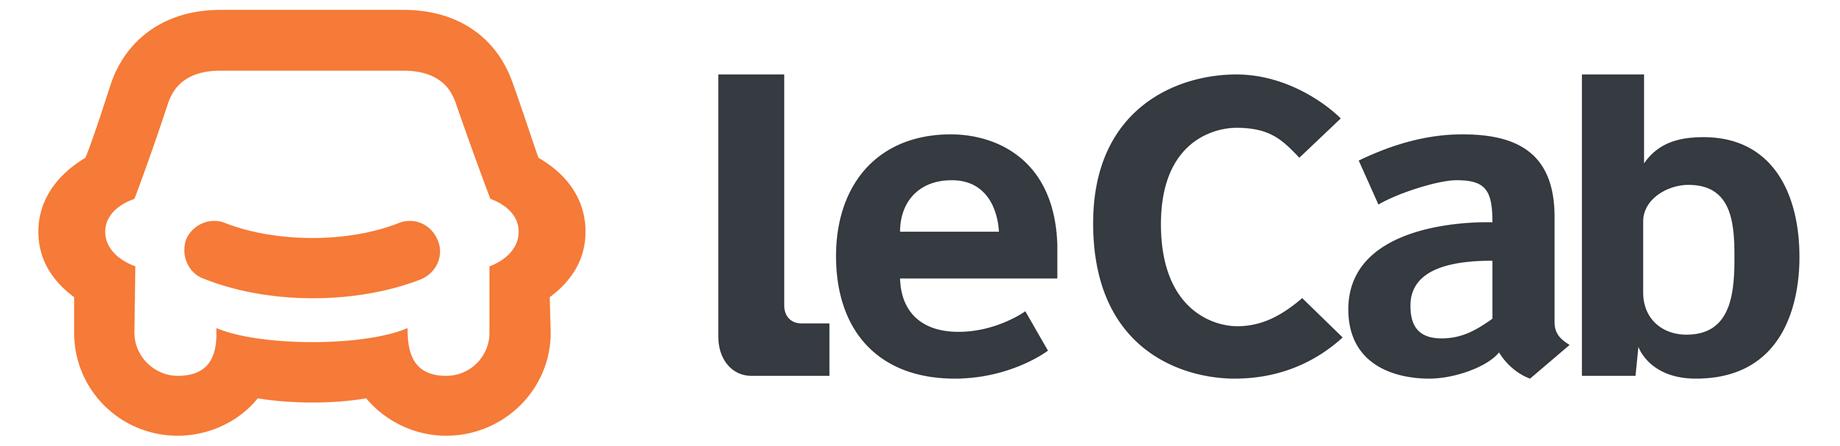 Taxi App LeCab Logo